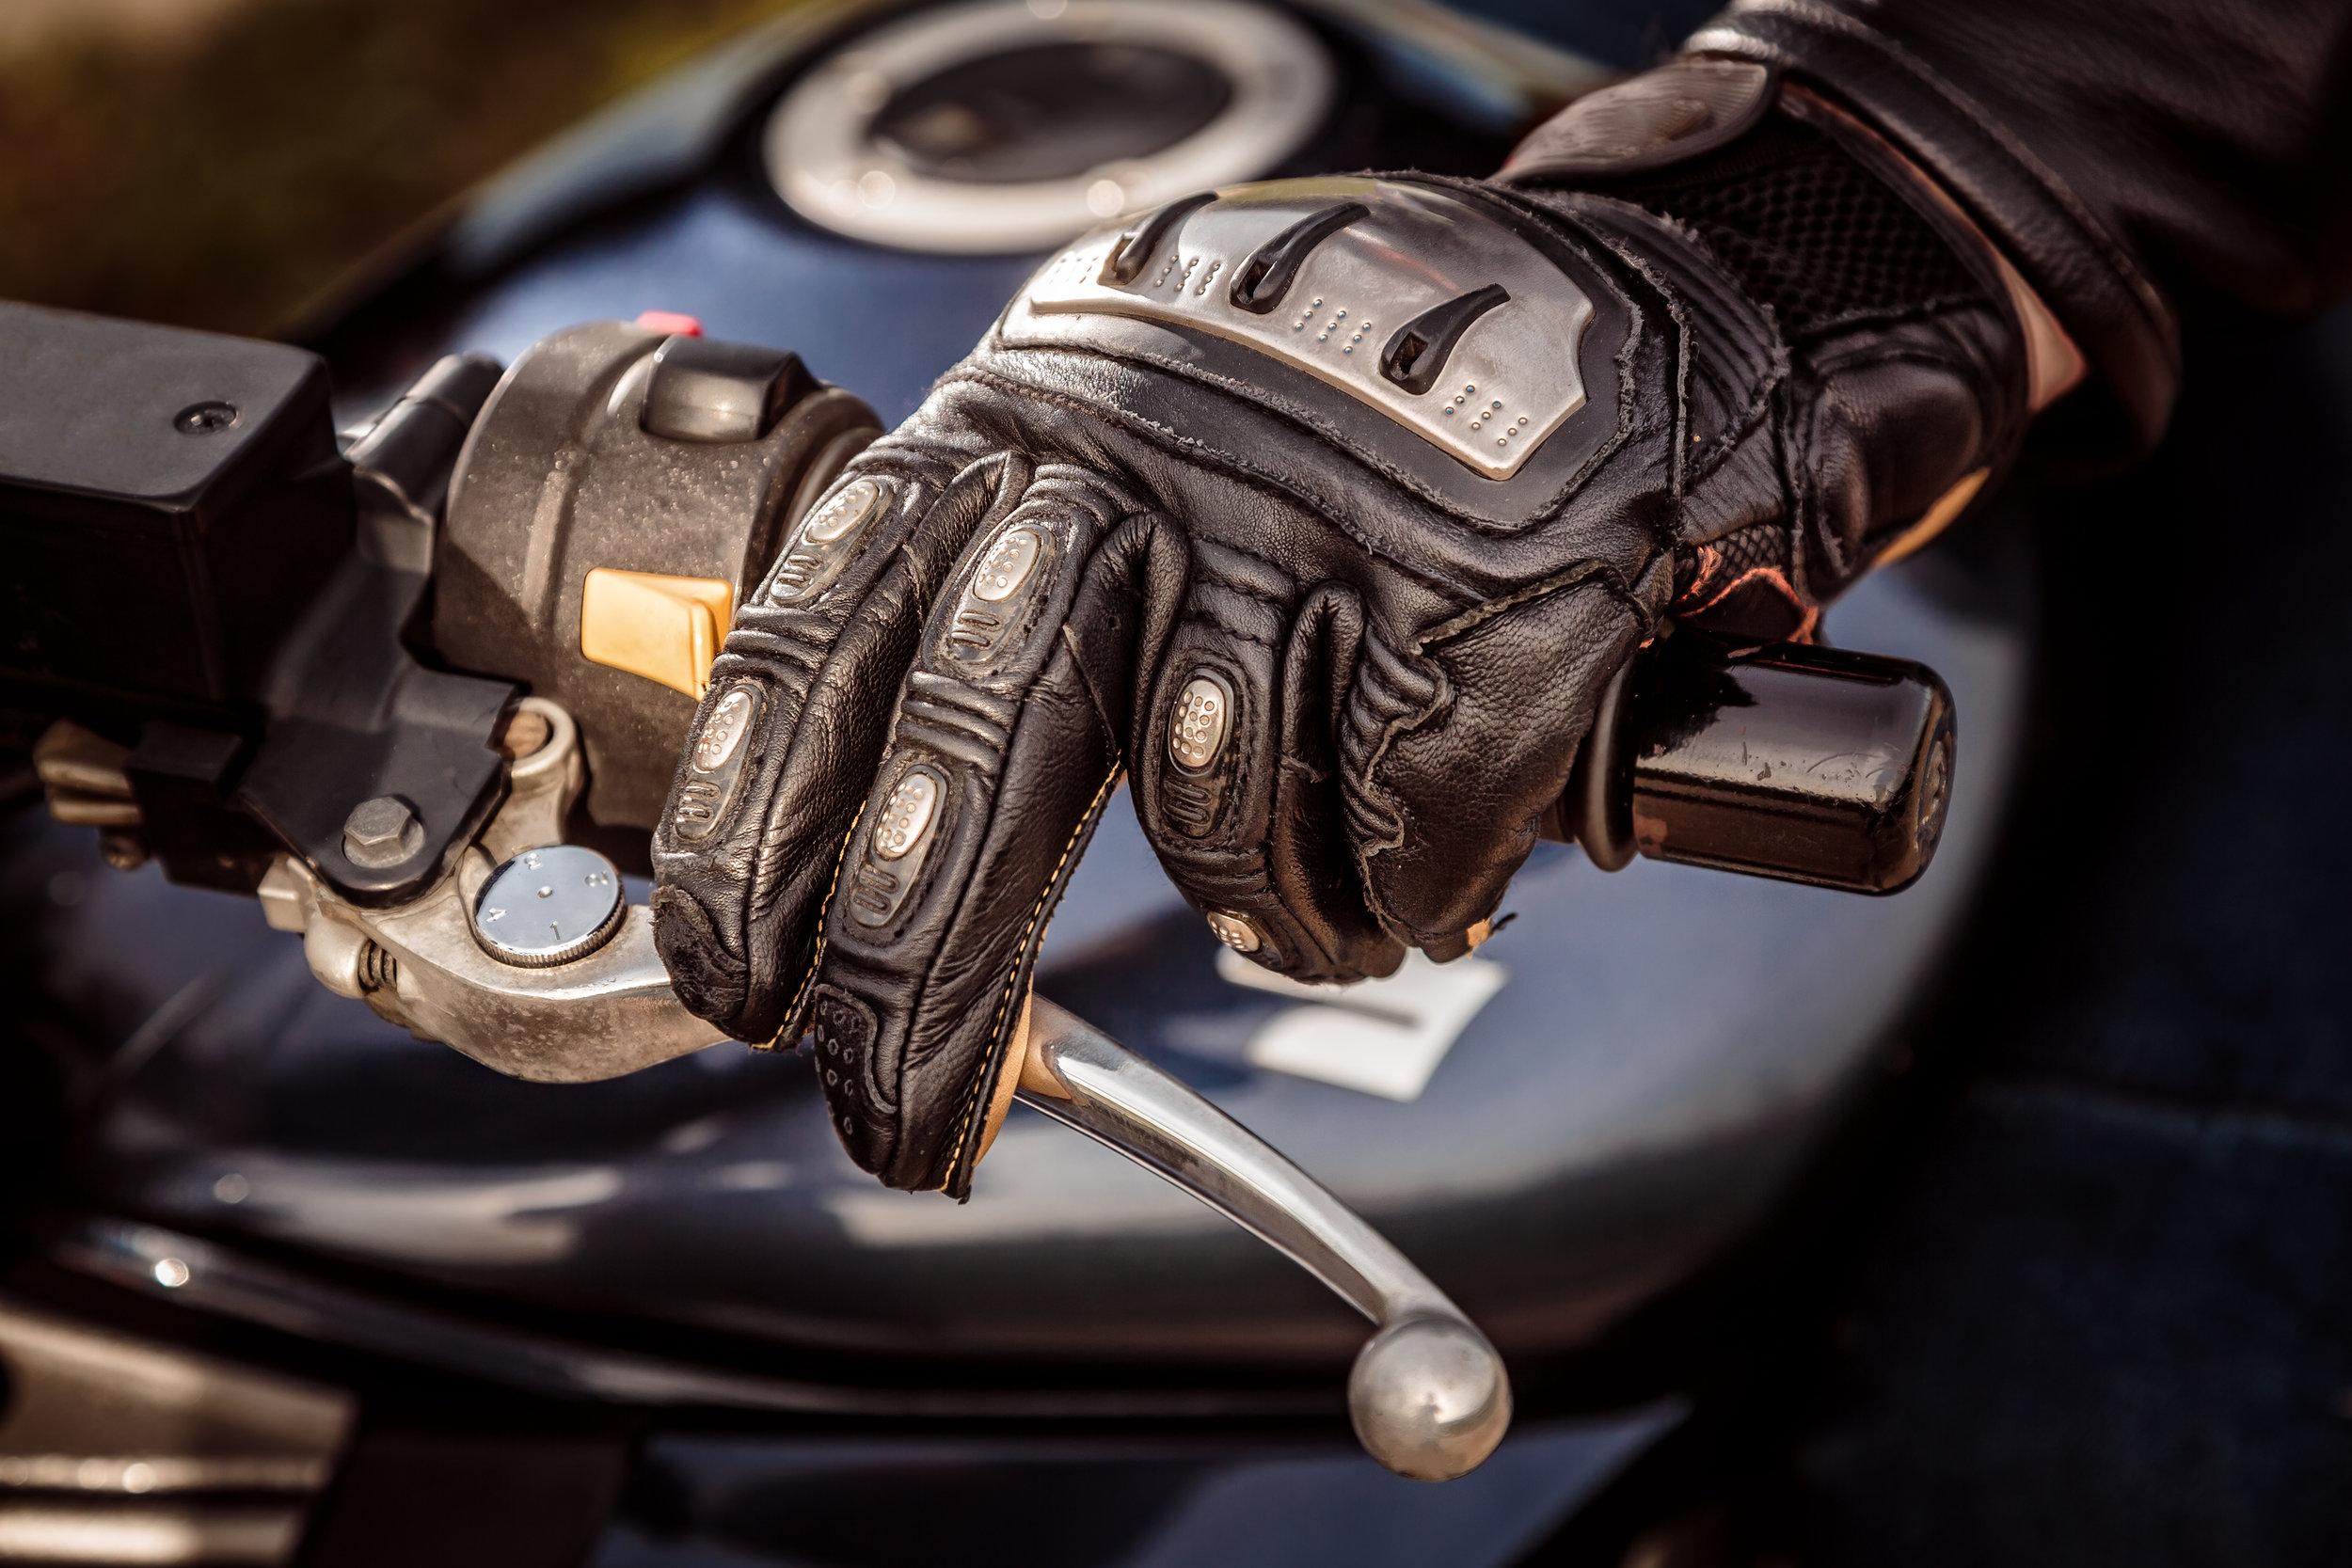 motorcycle-racing-gloves-PHCAPQA.jpg